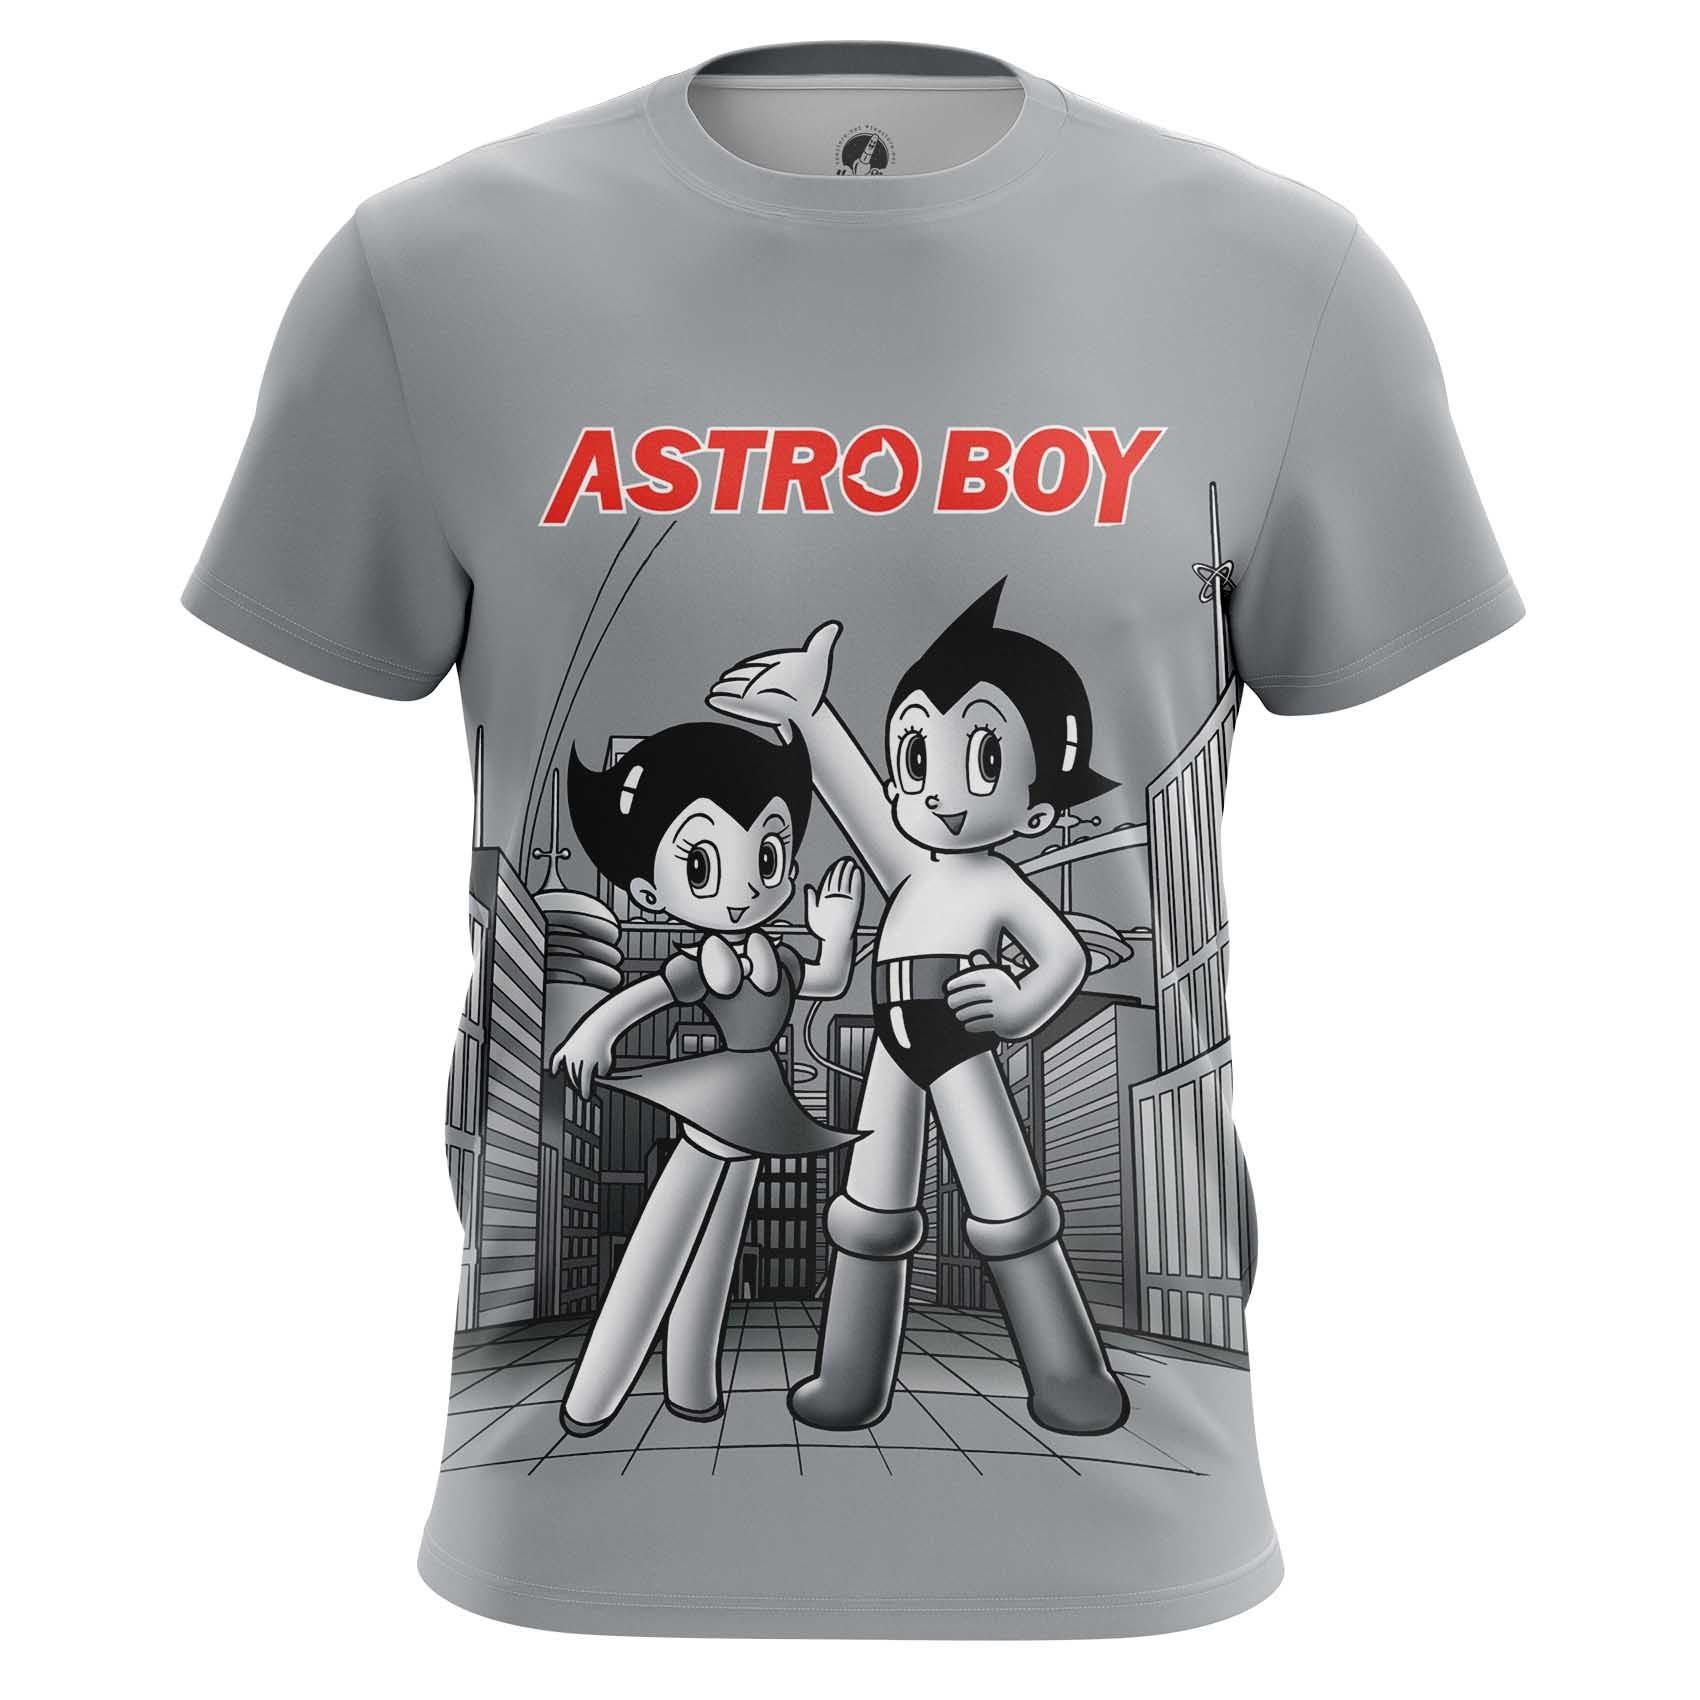 Merchandise T-Shirt Retro Astroboy Astro Boy Animated Series